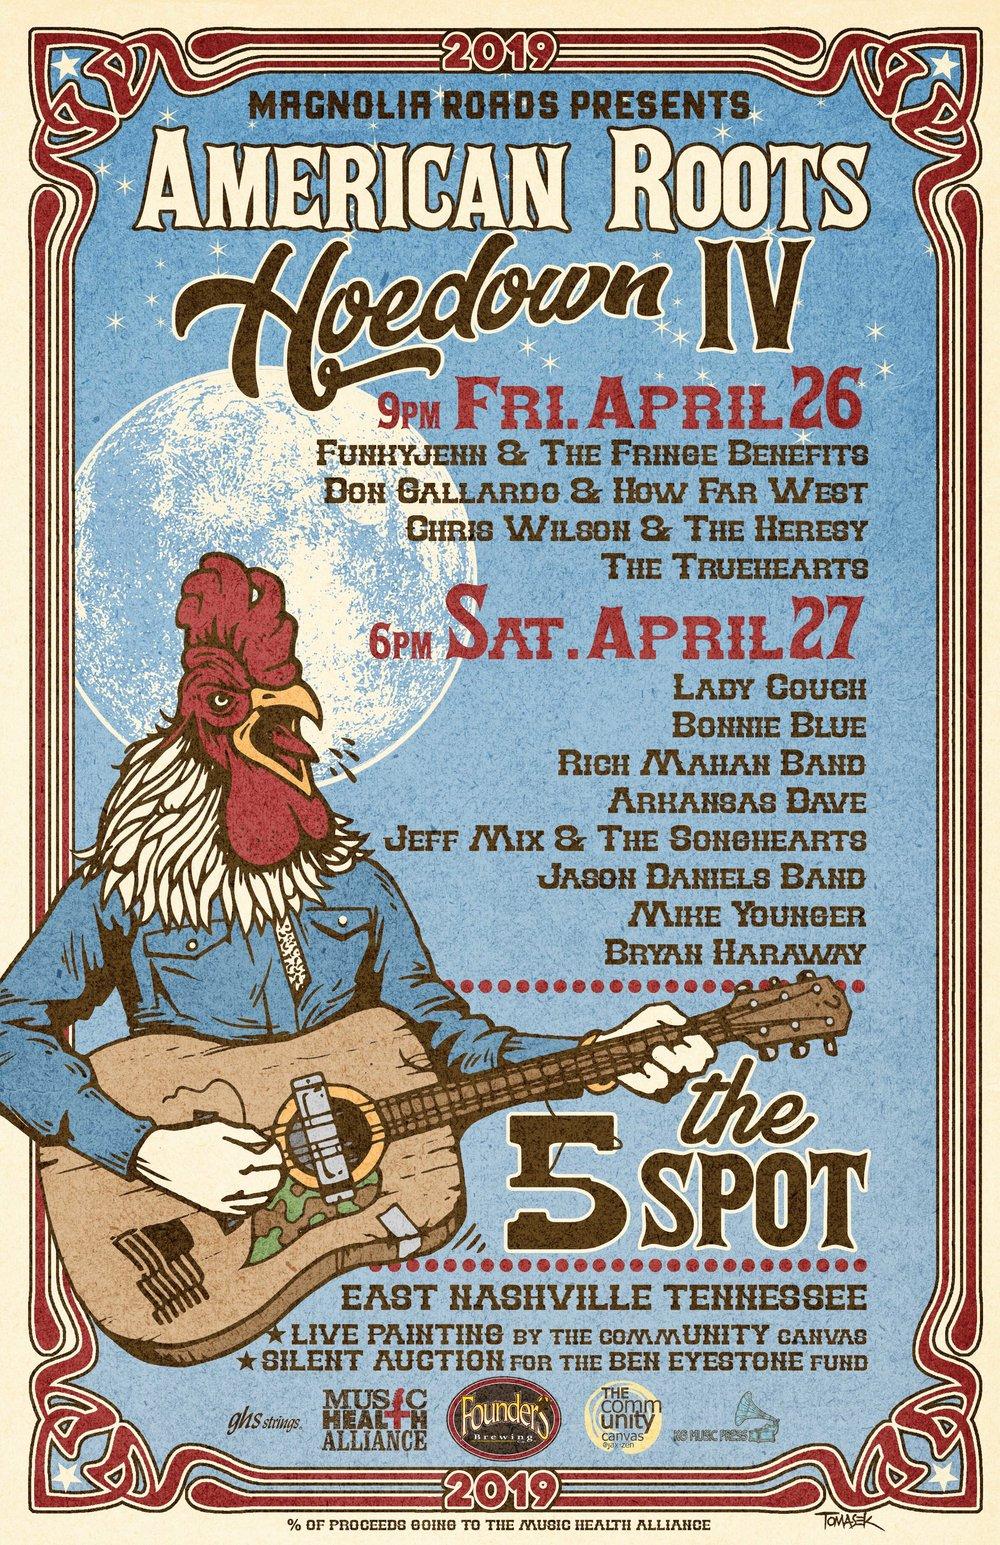 Magnolia Roads American Roots Hoedown IV-Poster.jpg